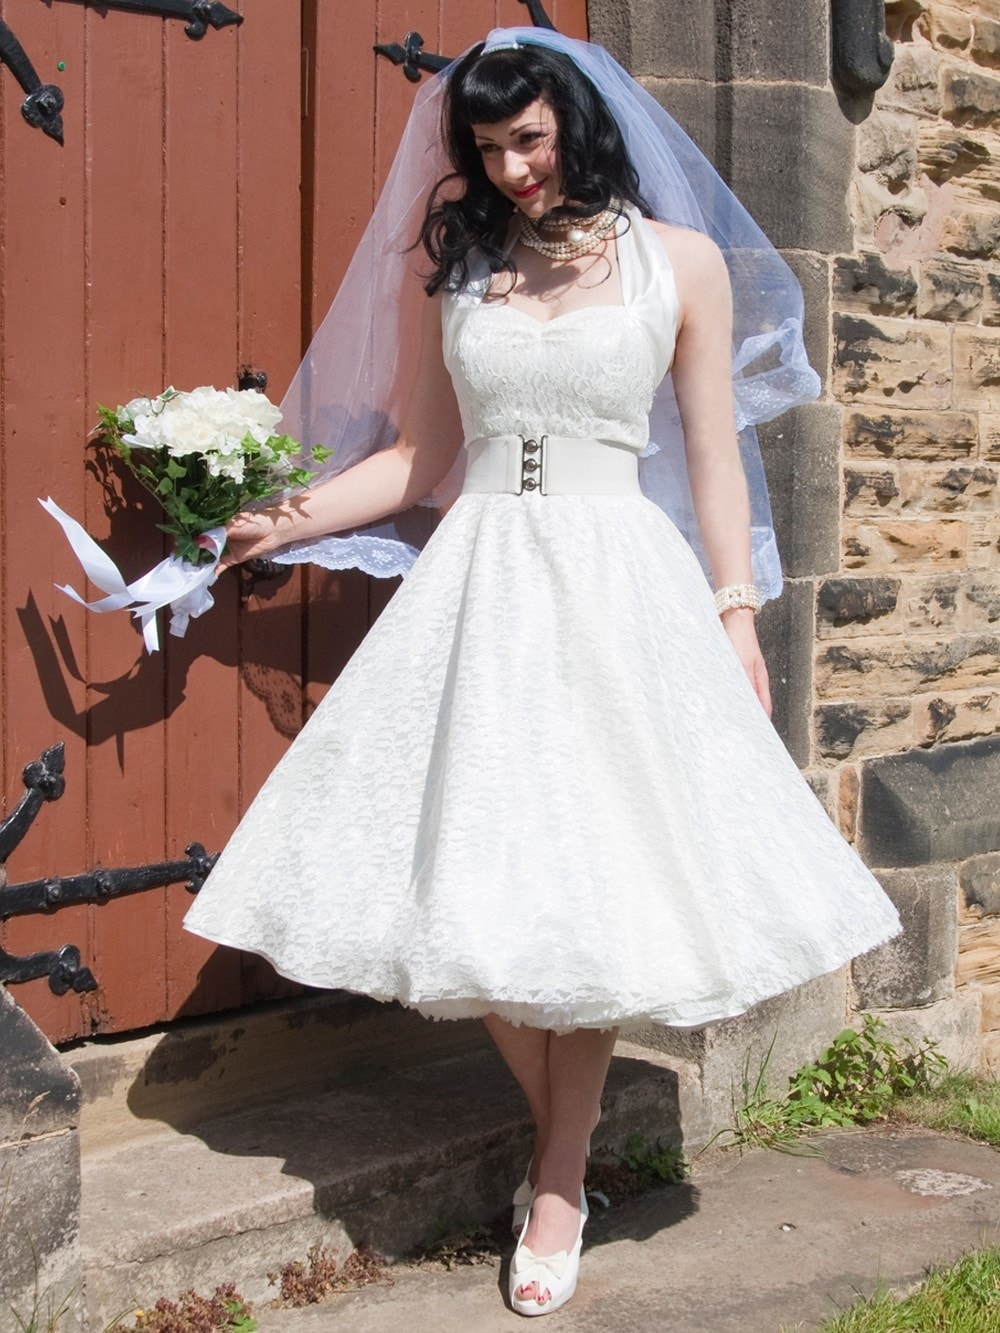 1950s Halterneck Luxury White Satin Lace Dress From Vivien Of Holloway,Summer Wedding Dresses Guest 2020